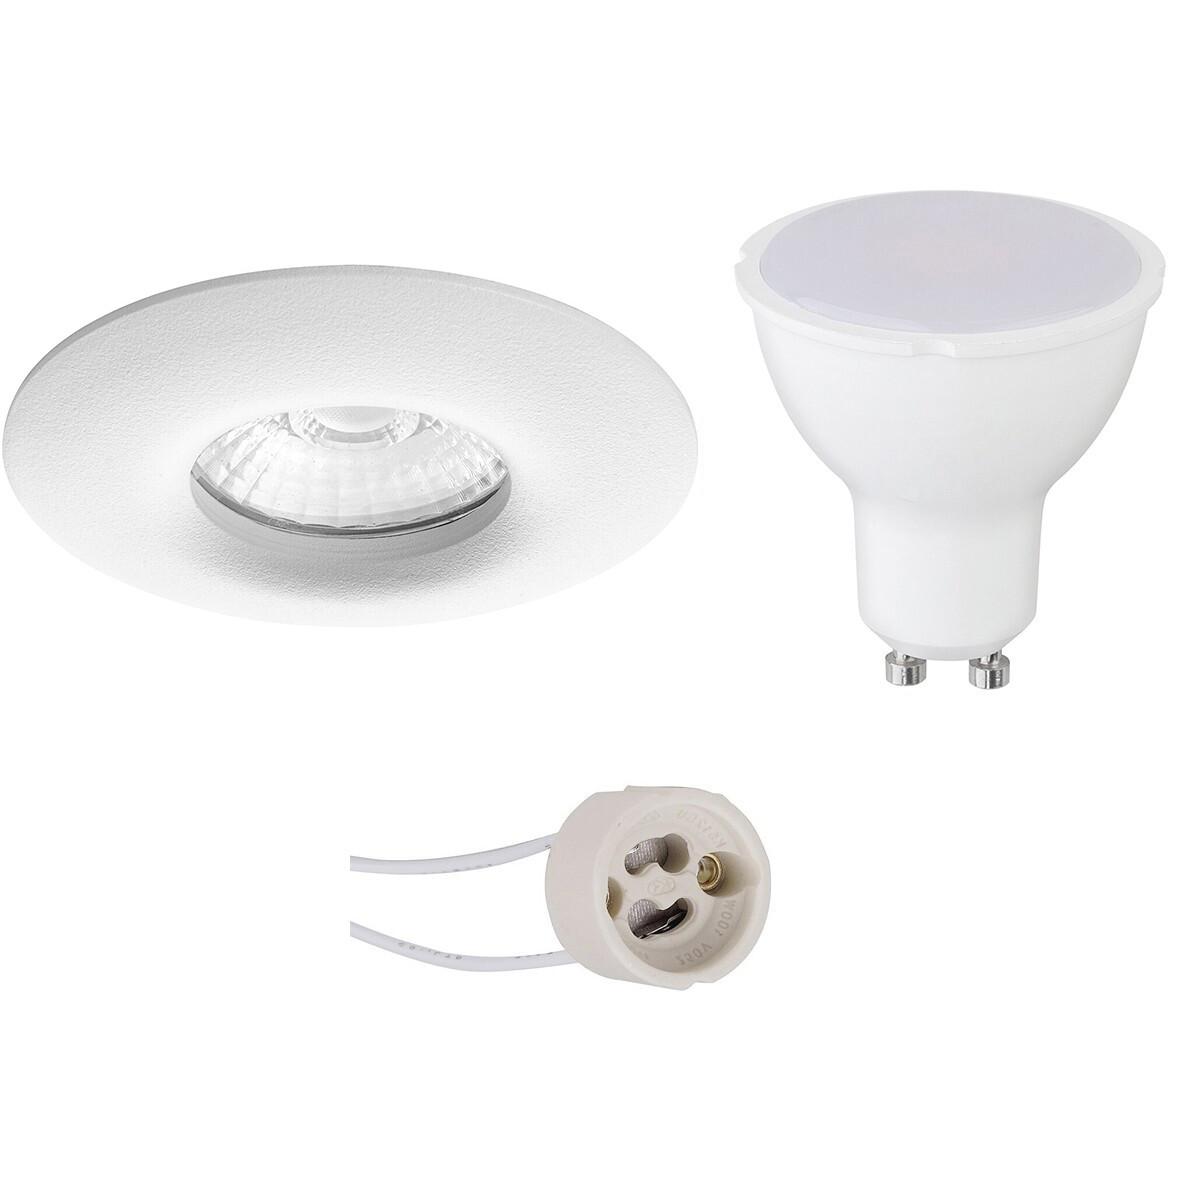 LED Spot Set - Aigi - Pragmi Luno Pro - Waterdicht IP65 - GU10 Fitting - Inbouw Rond - Mat Wit - 8W